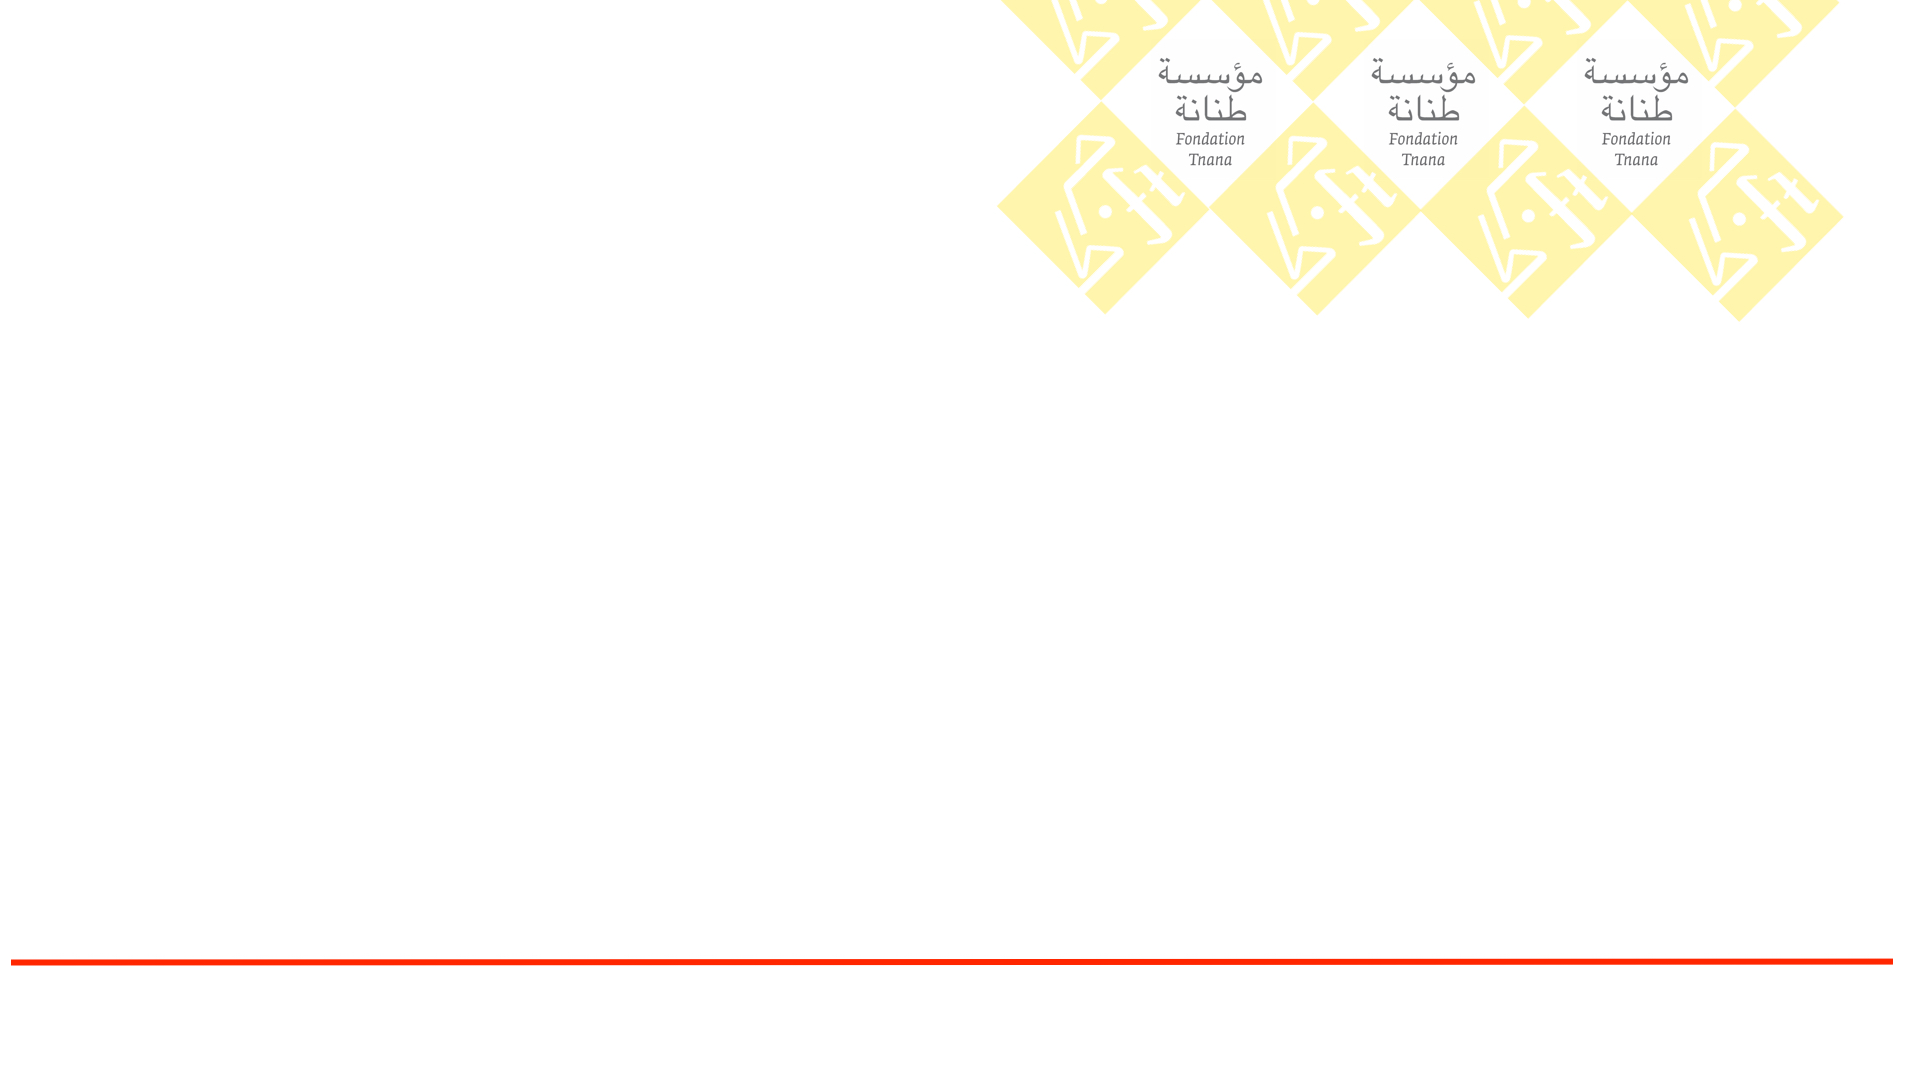 FONDATION TNANA DOSSIER PDF 10.08.17.001.jpeg